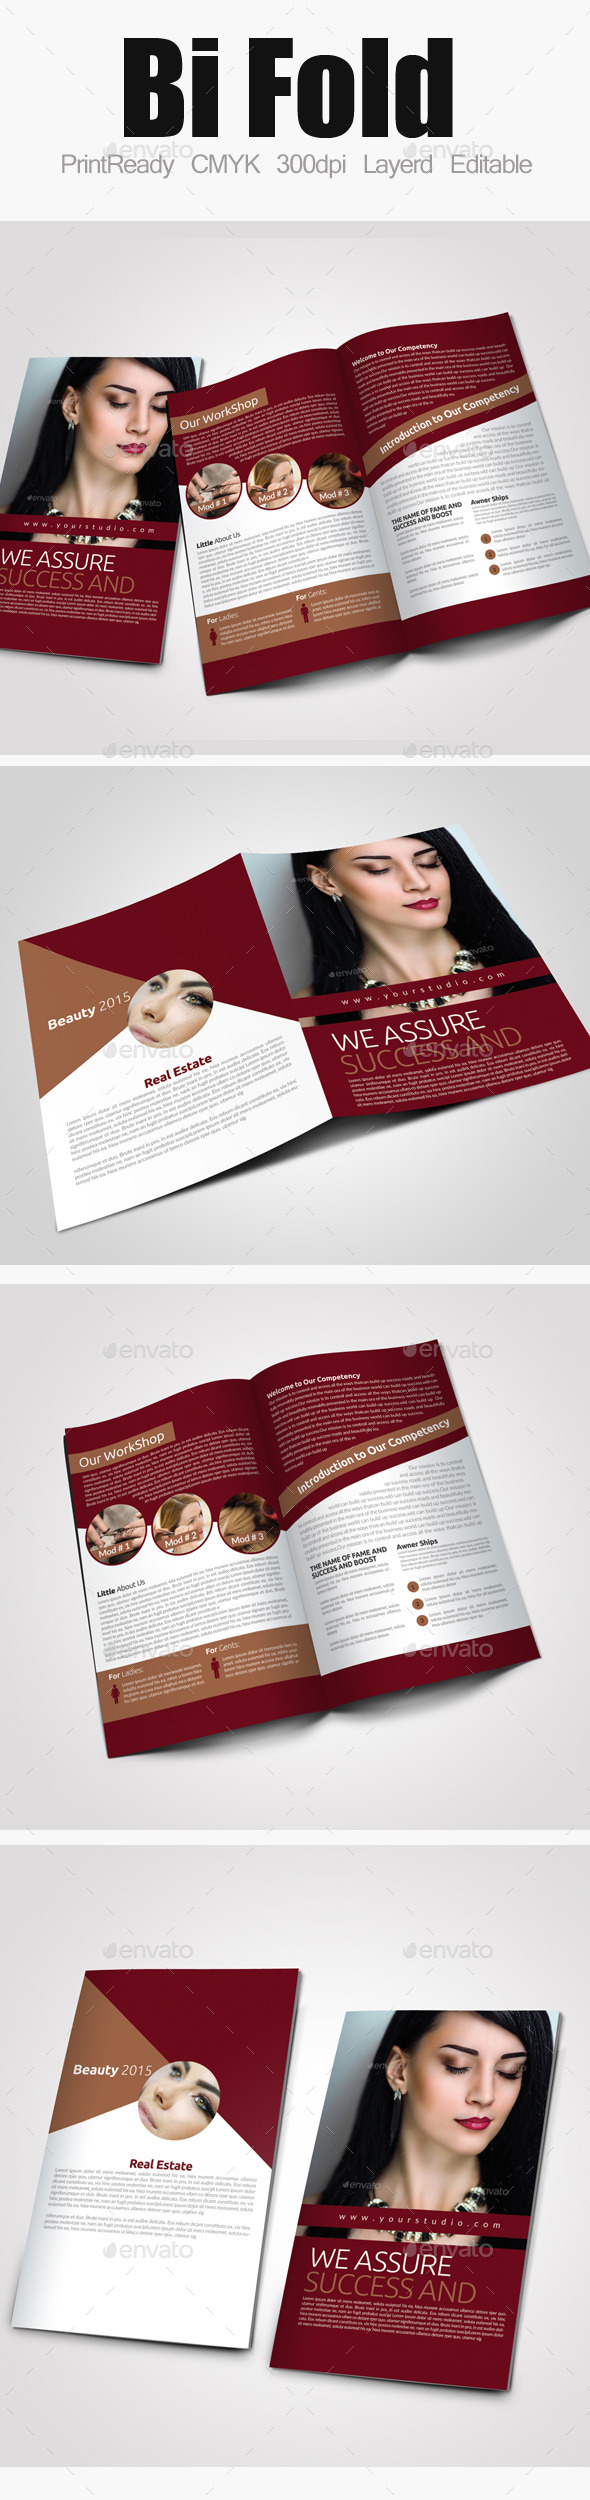 GraphicRiver Bi Fold Business Brochure 9595558